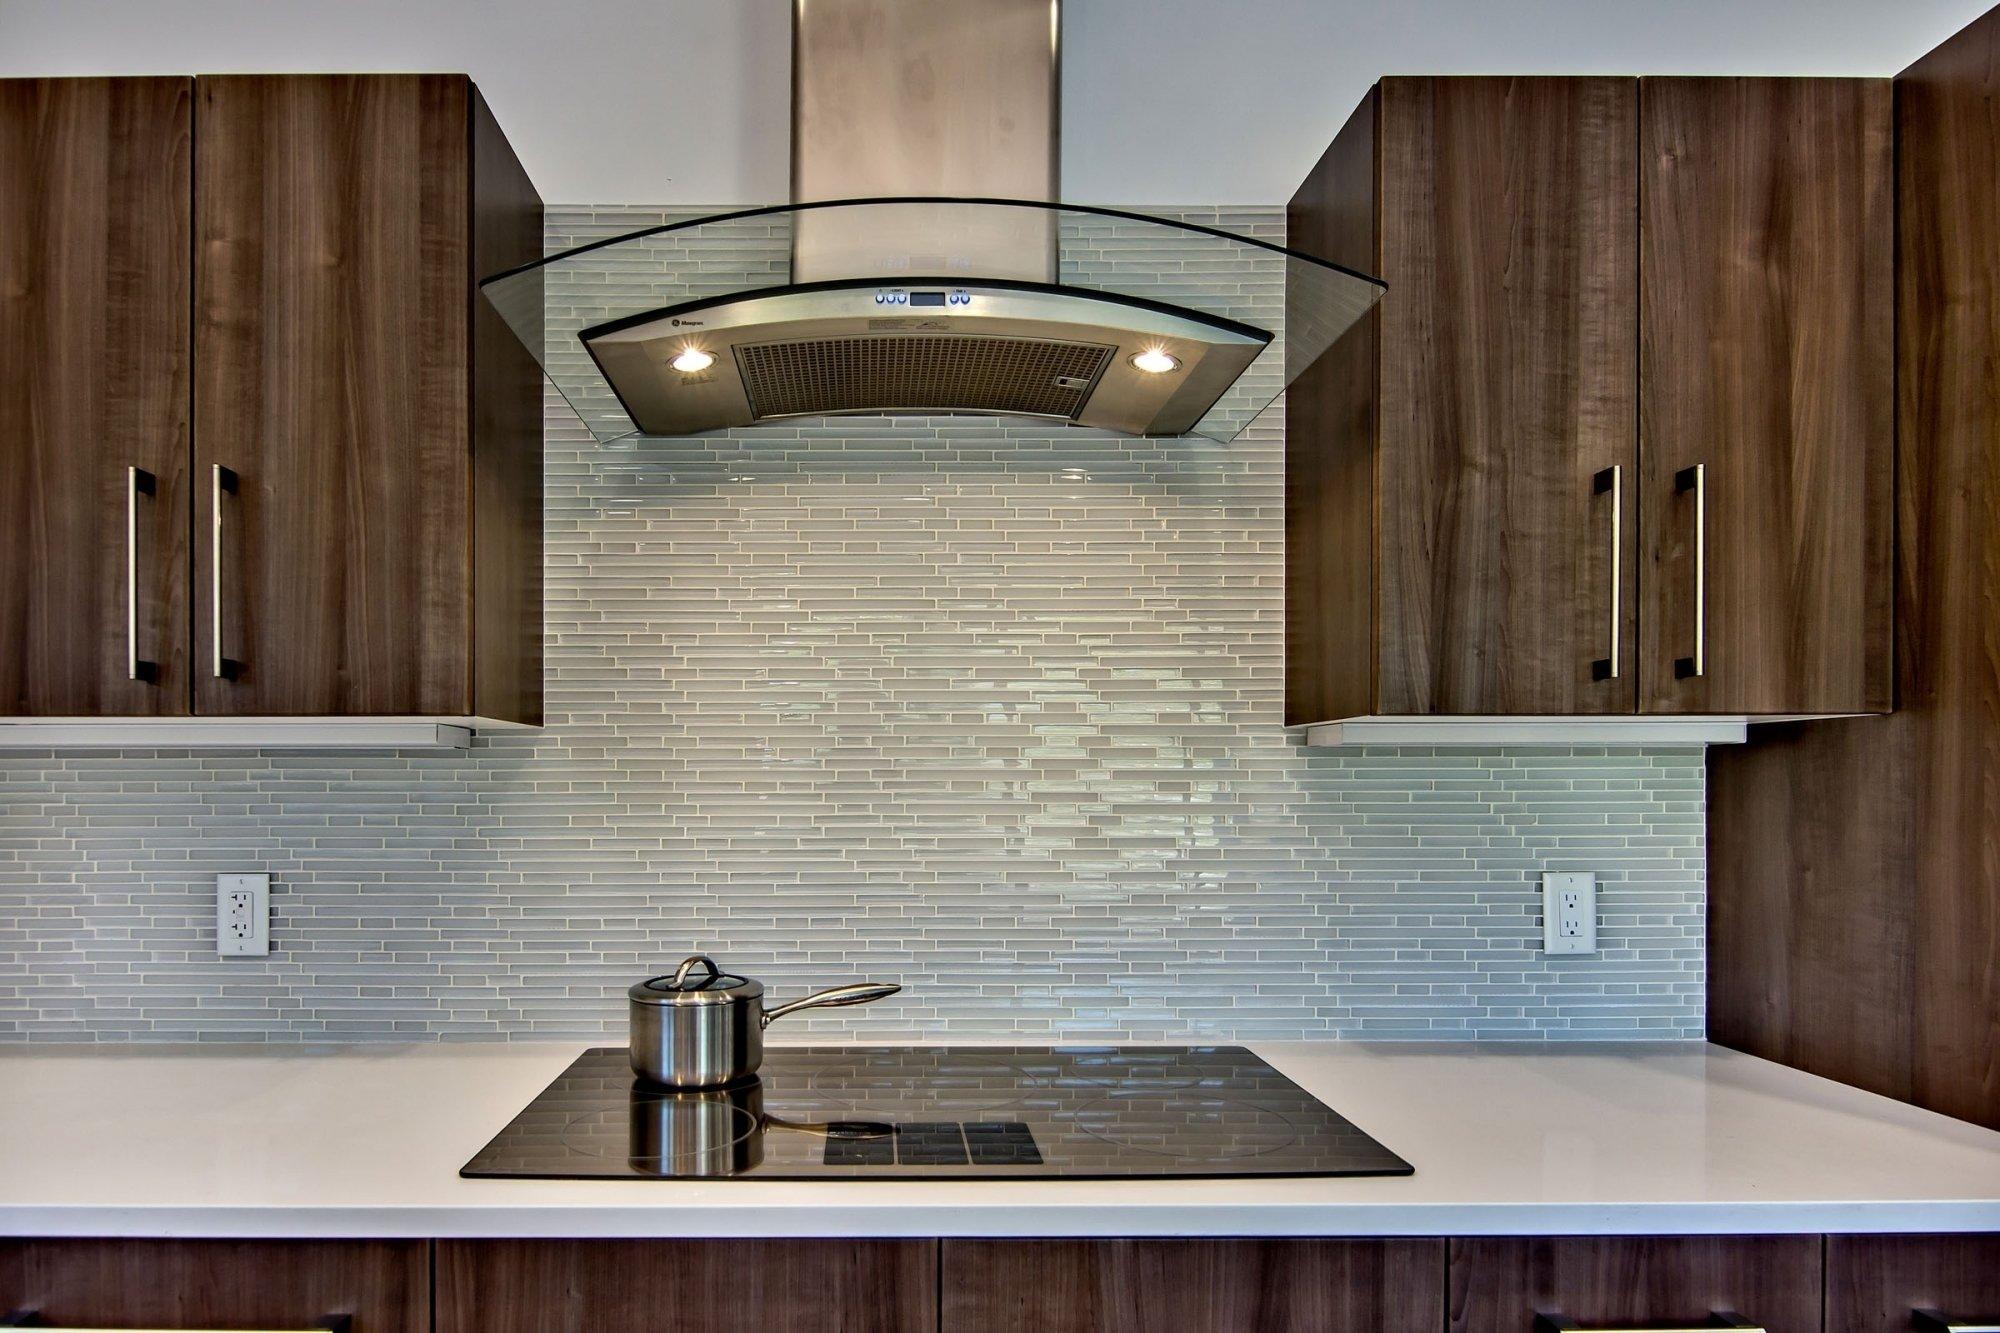 10 Stunning Backsplash Ideas For Kitchens Inexpensive easy backsplash kitchen at home railing stairs and kitchen design 2021